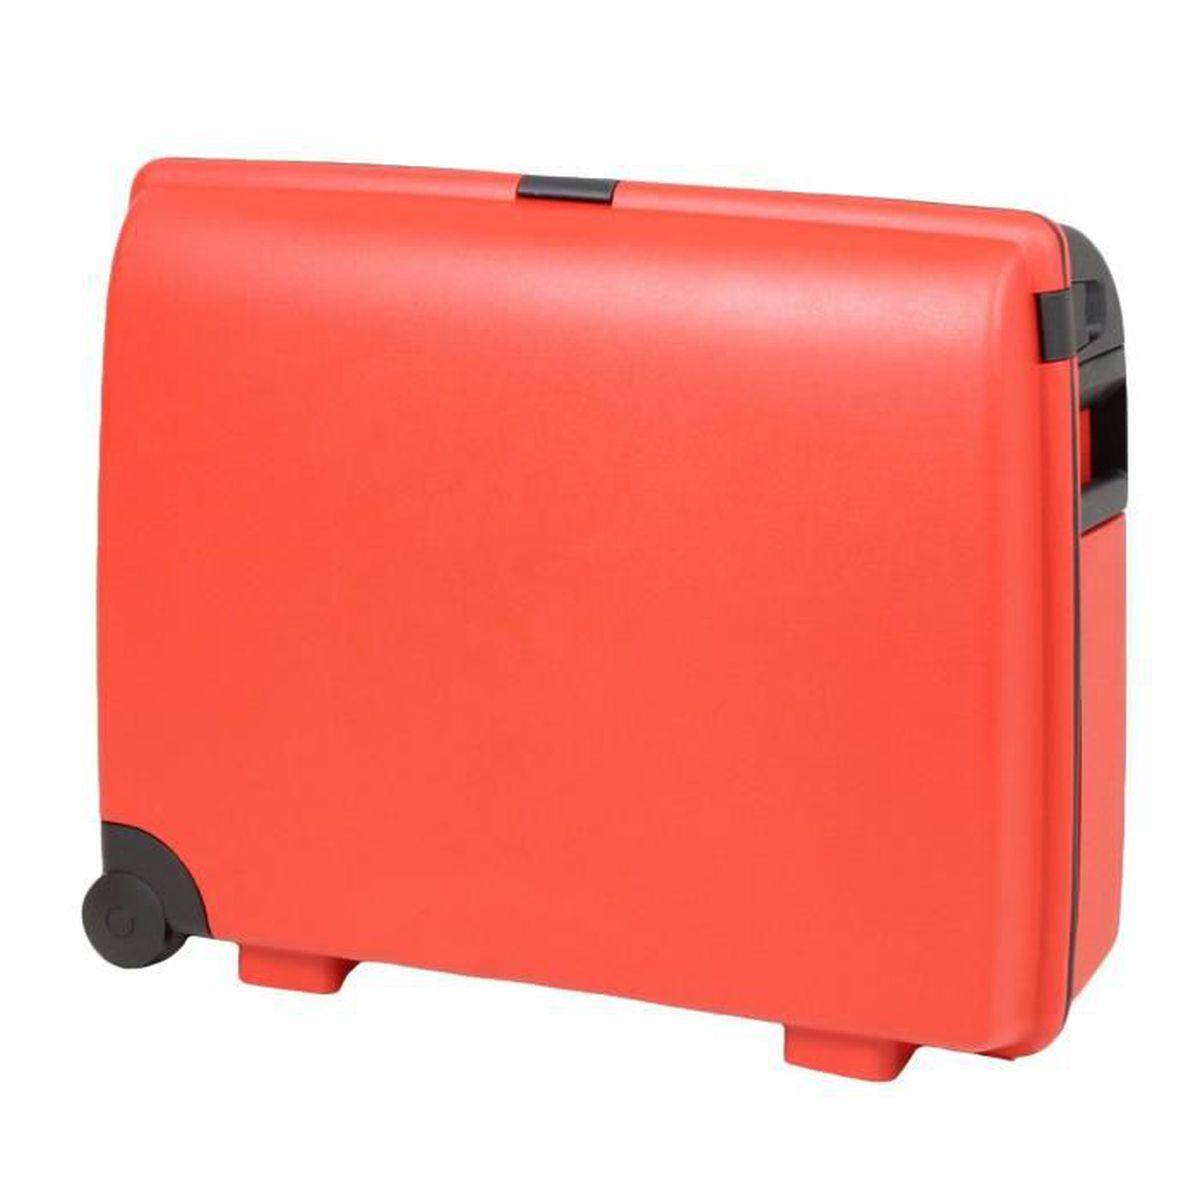 carlton airtec coque rigide 2 roues 86litre valise de. Black Bedroom Furniture Sets. Home Design Ideas